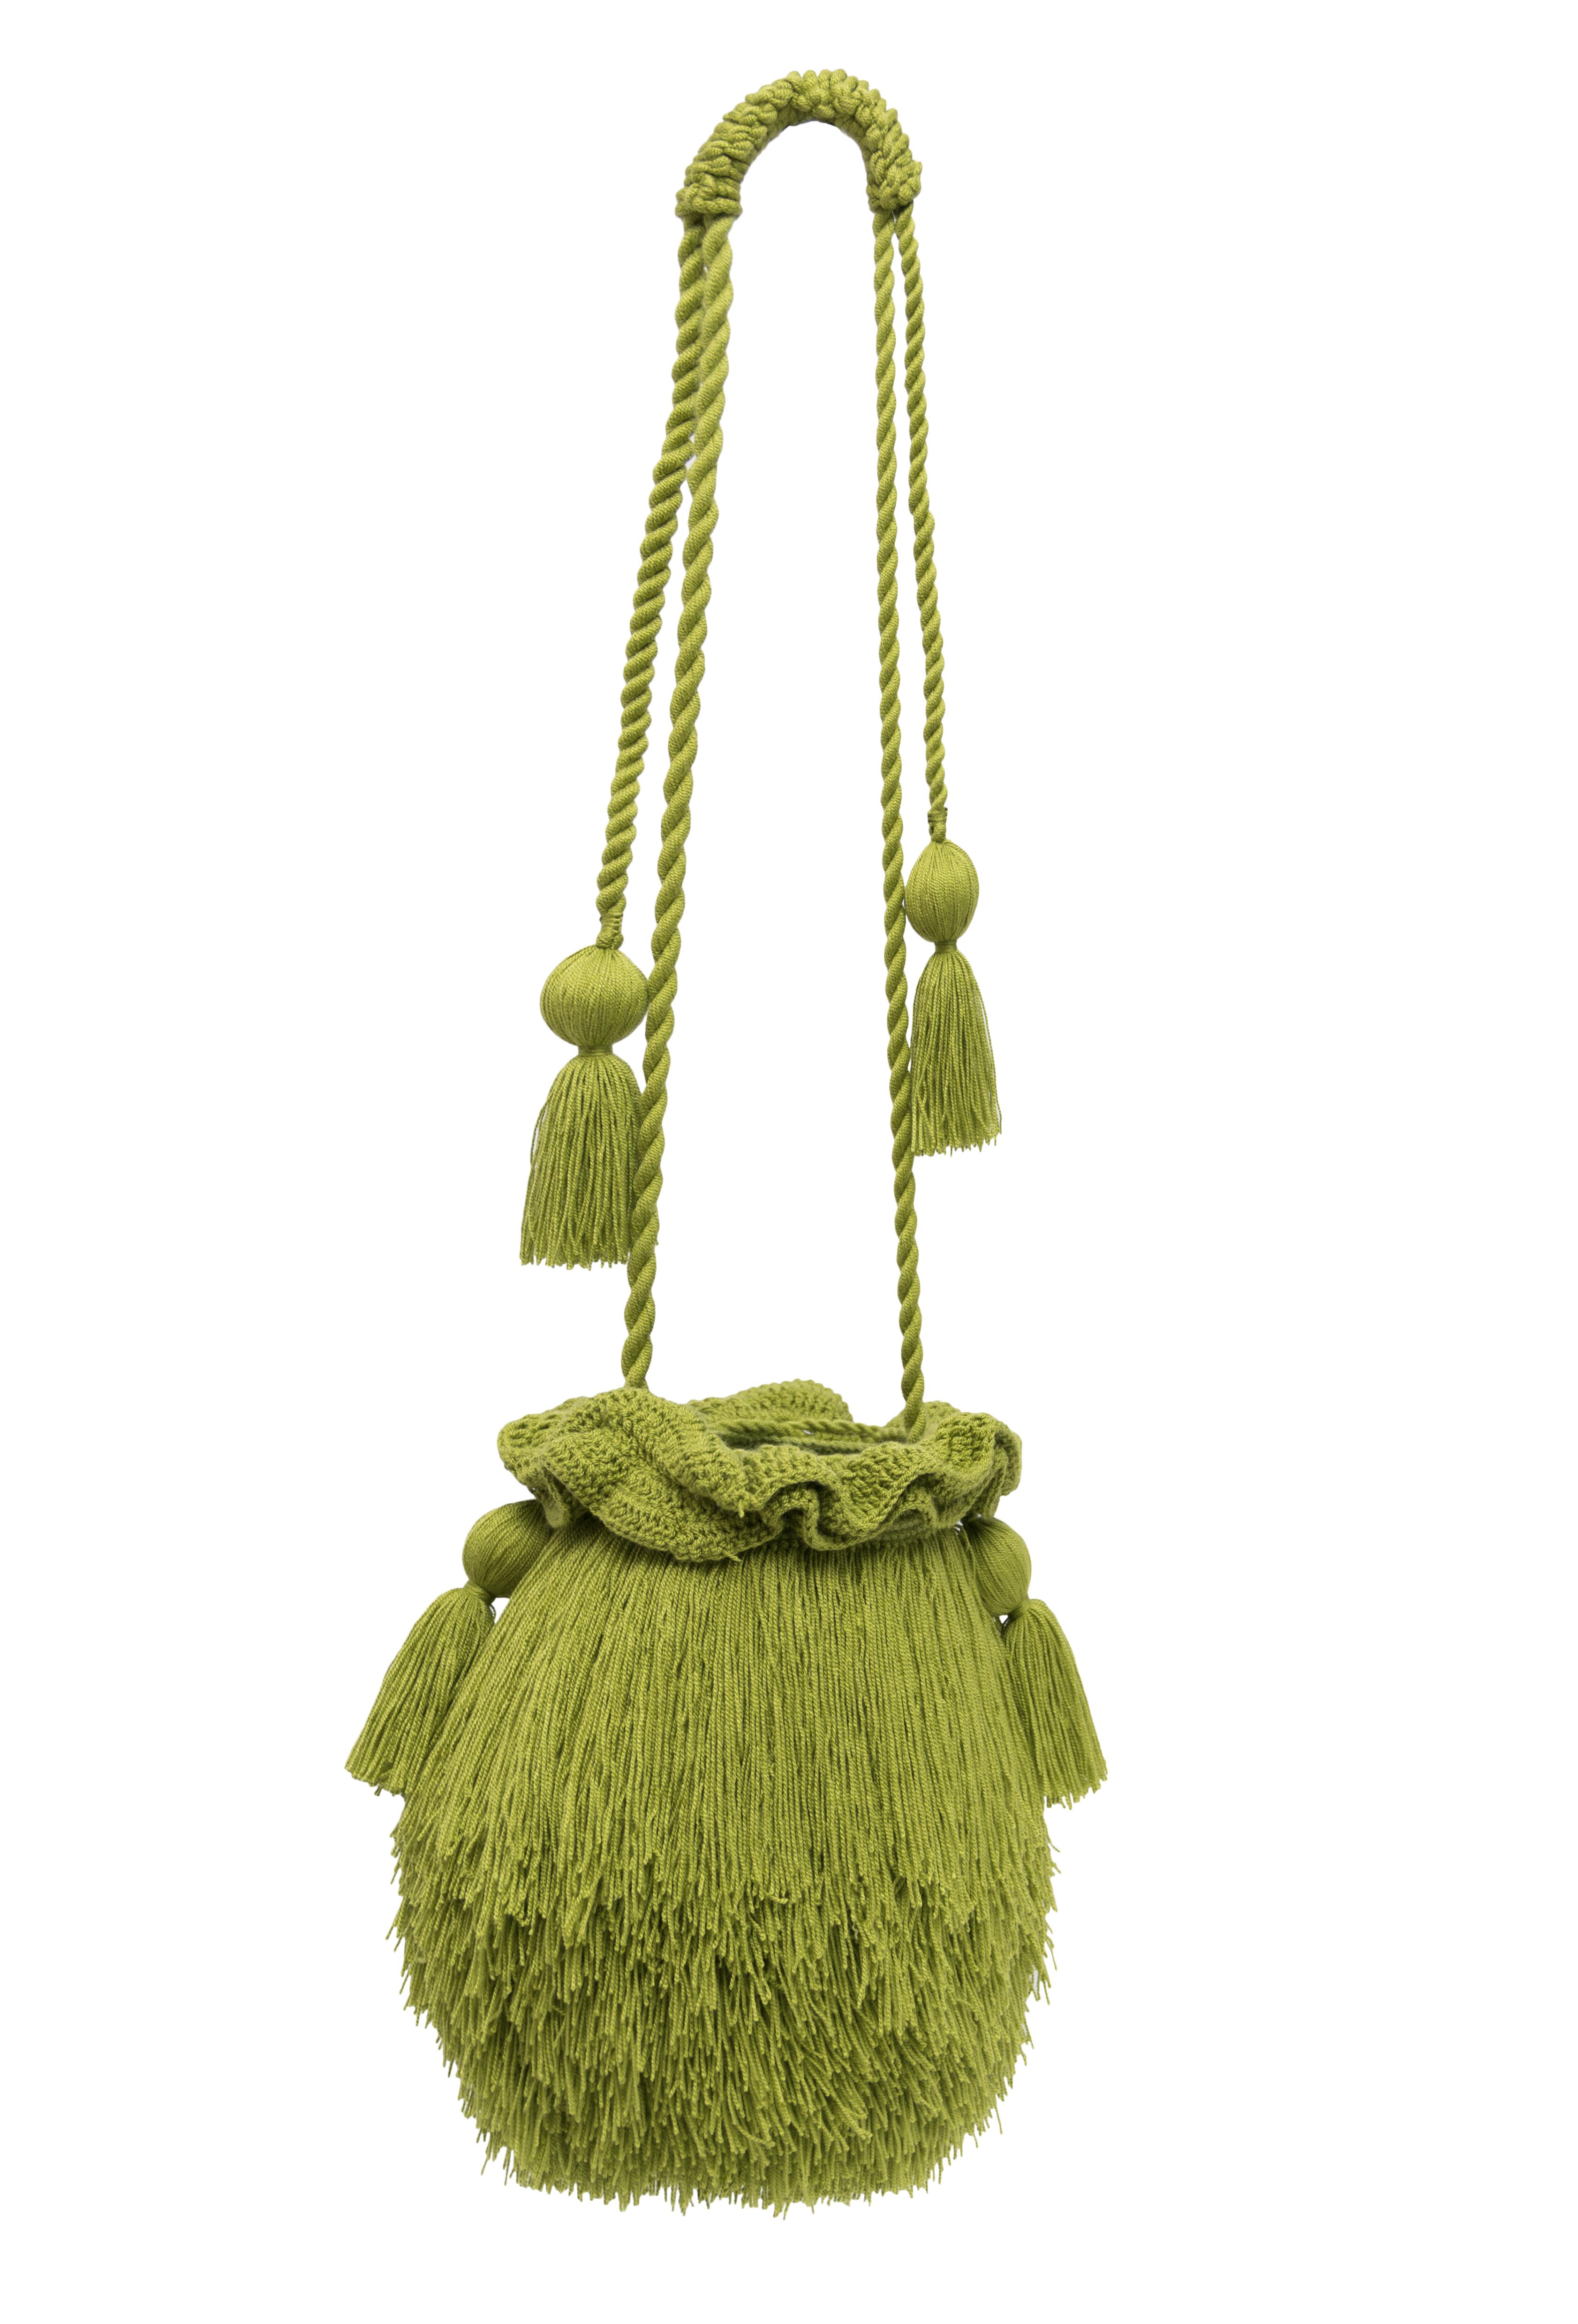 Olive green Mechuda backpack